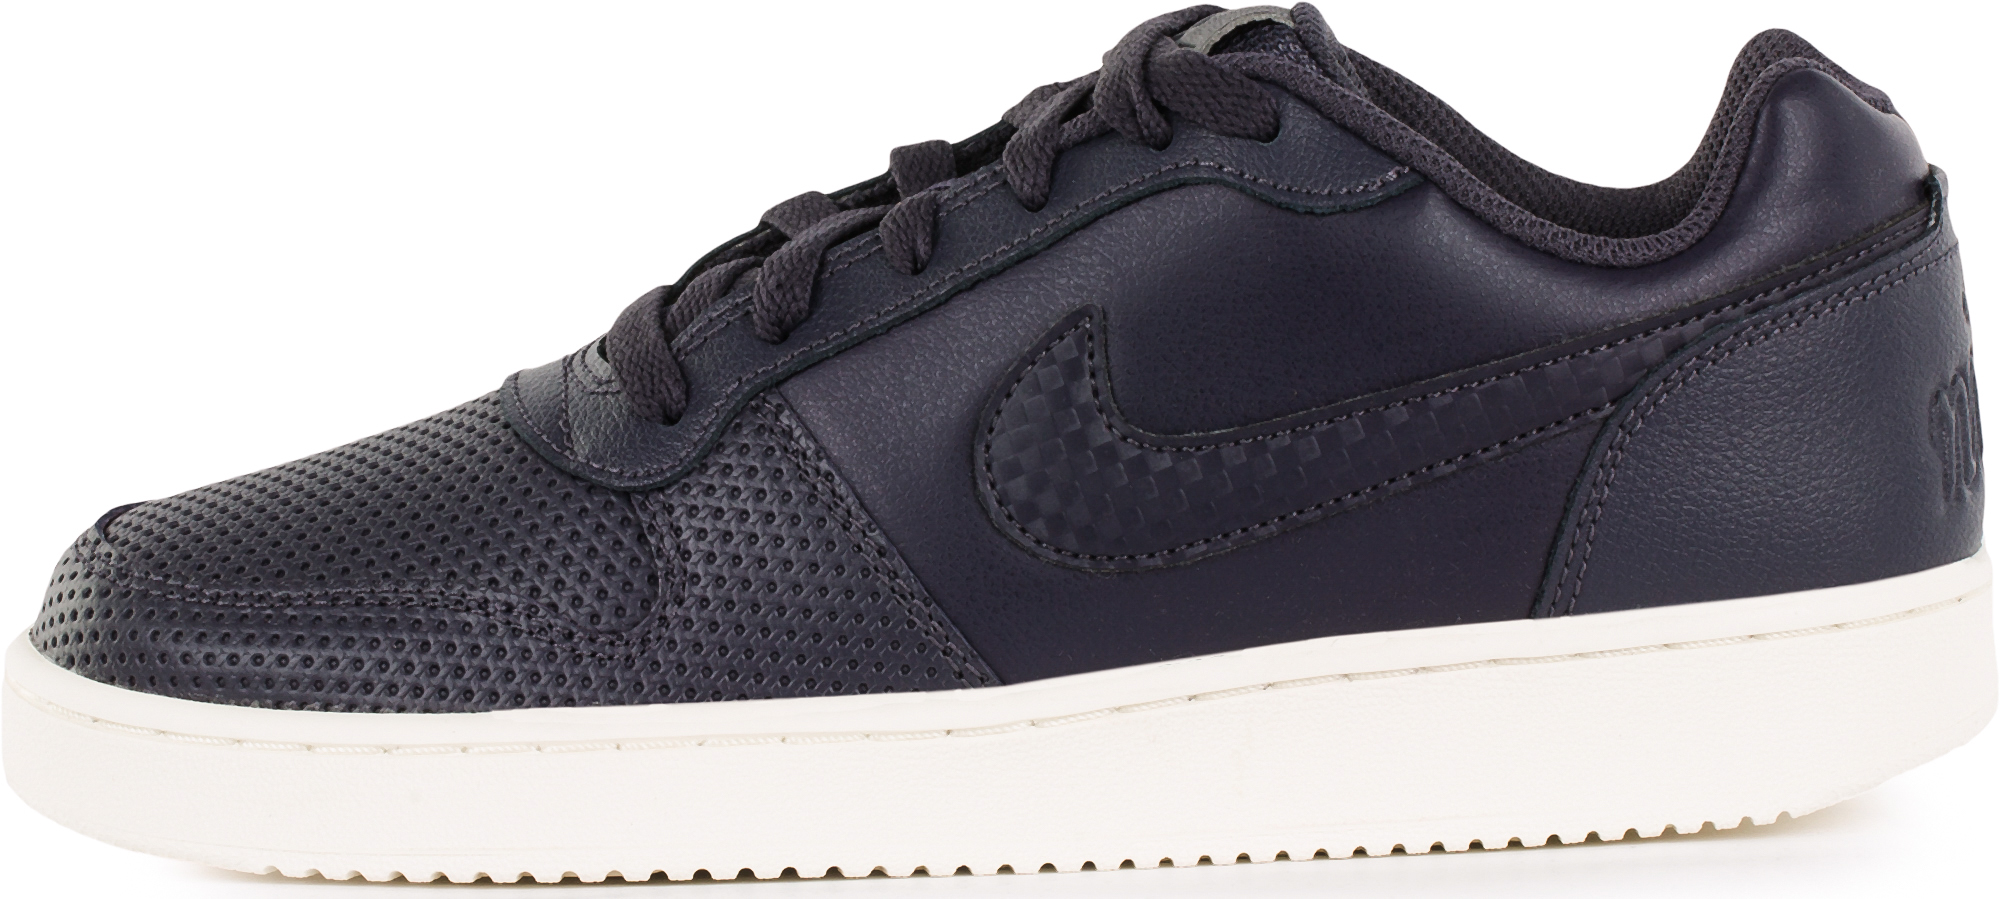 Nike Кеды женские Nike Ebernon Low Premium, размер 41 женские кеды i